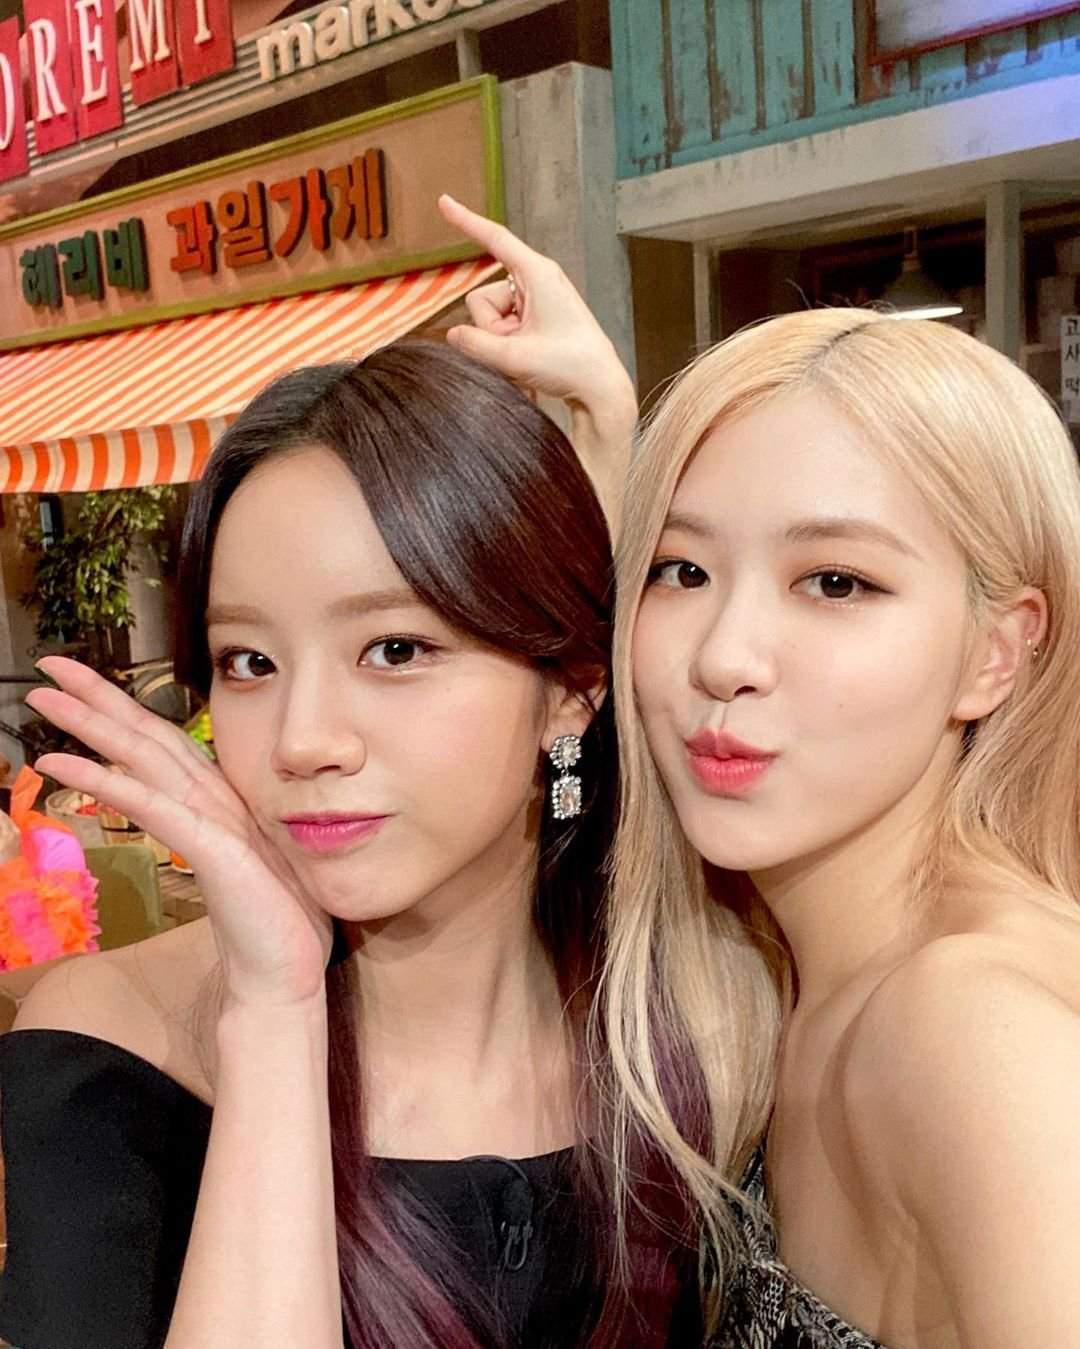 rose and hyeri